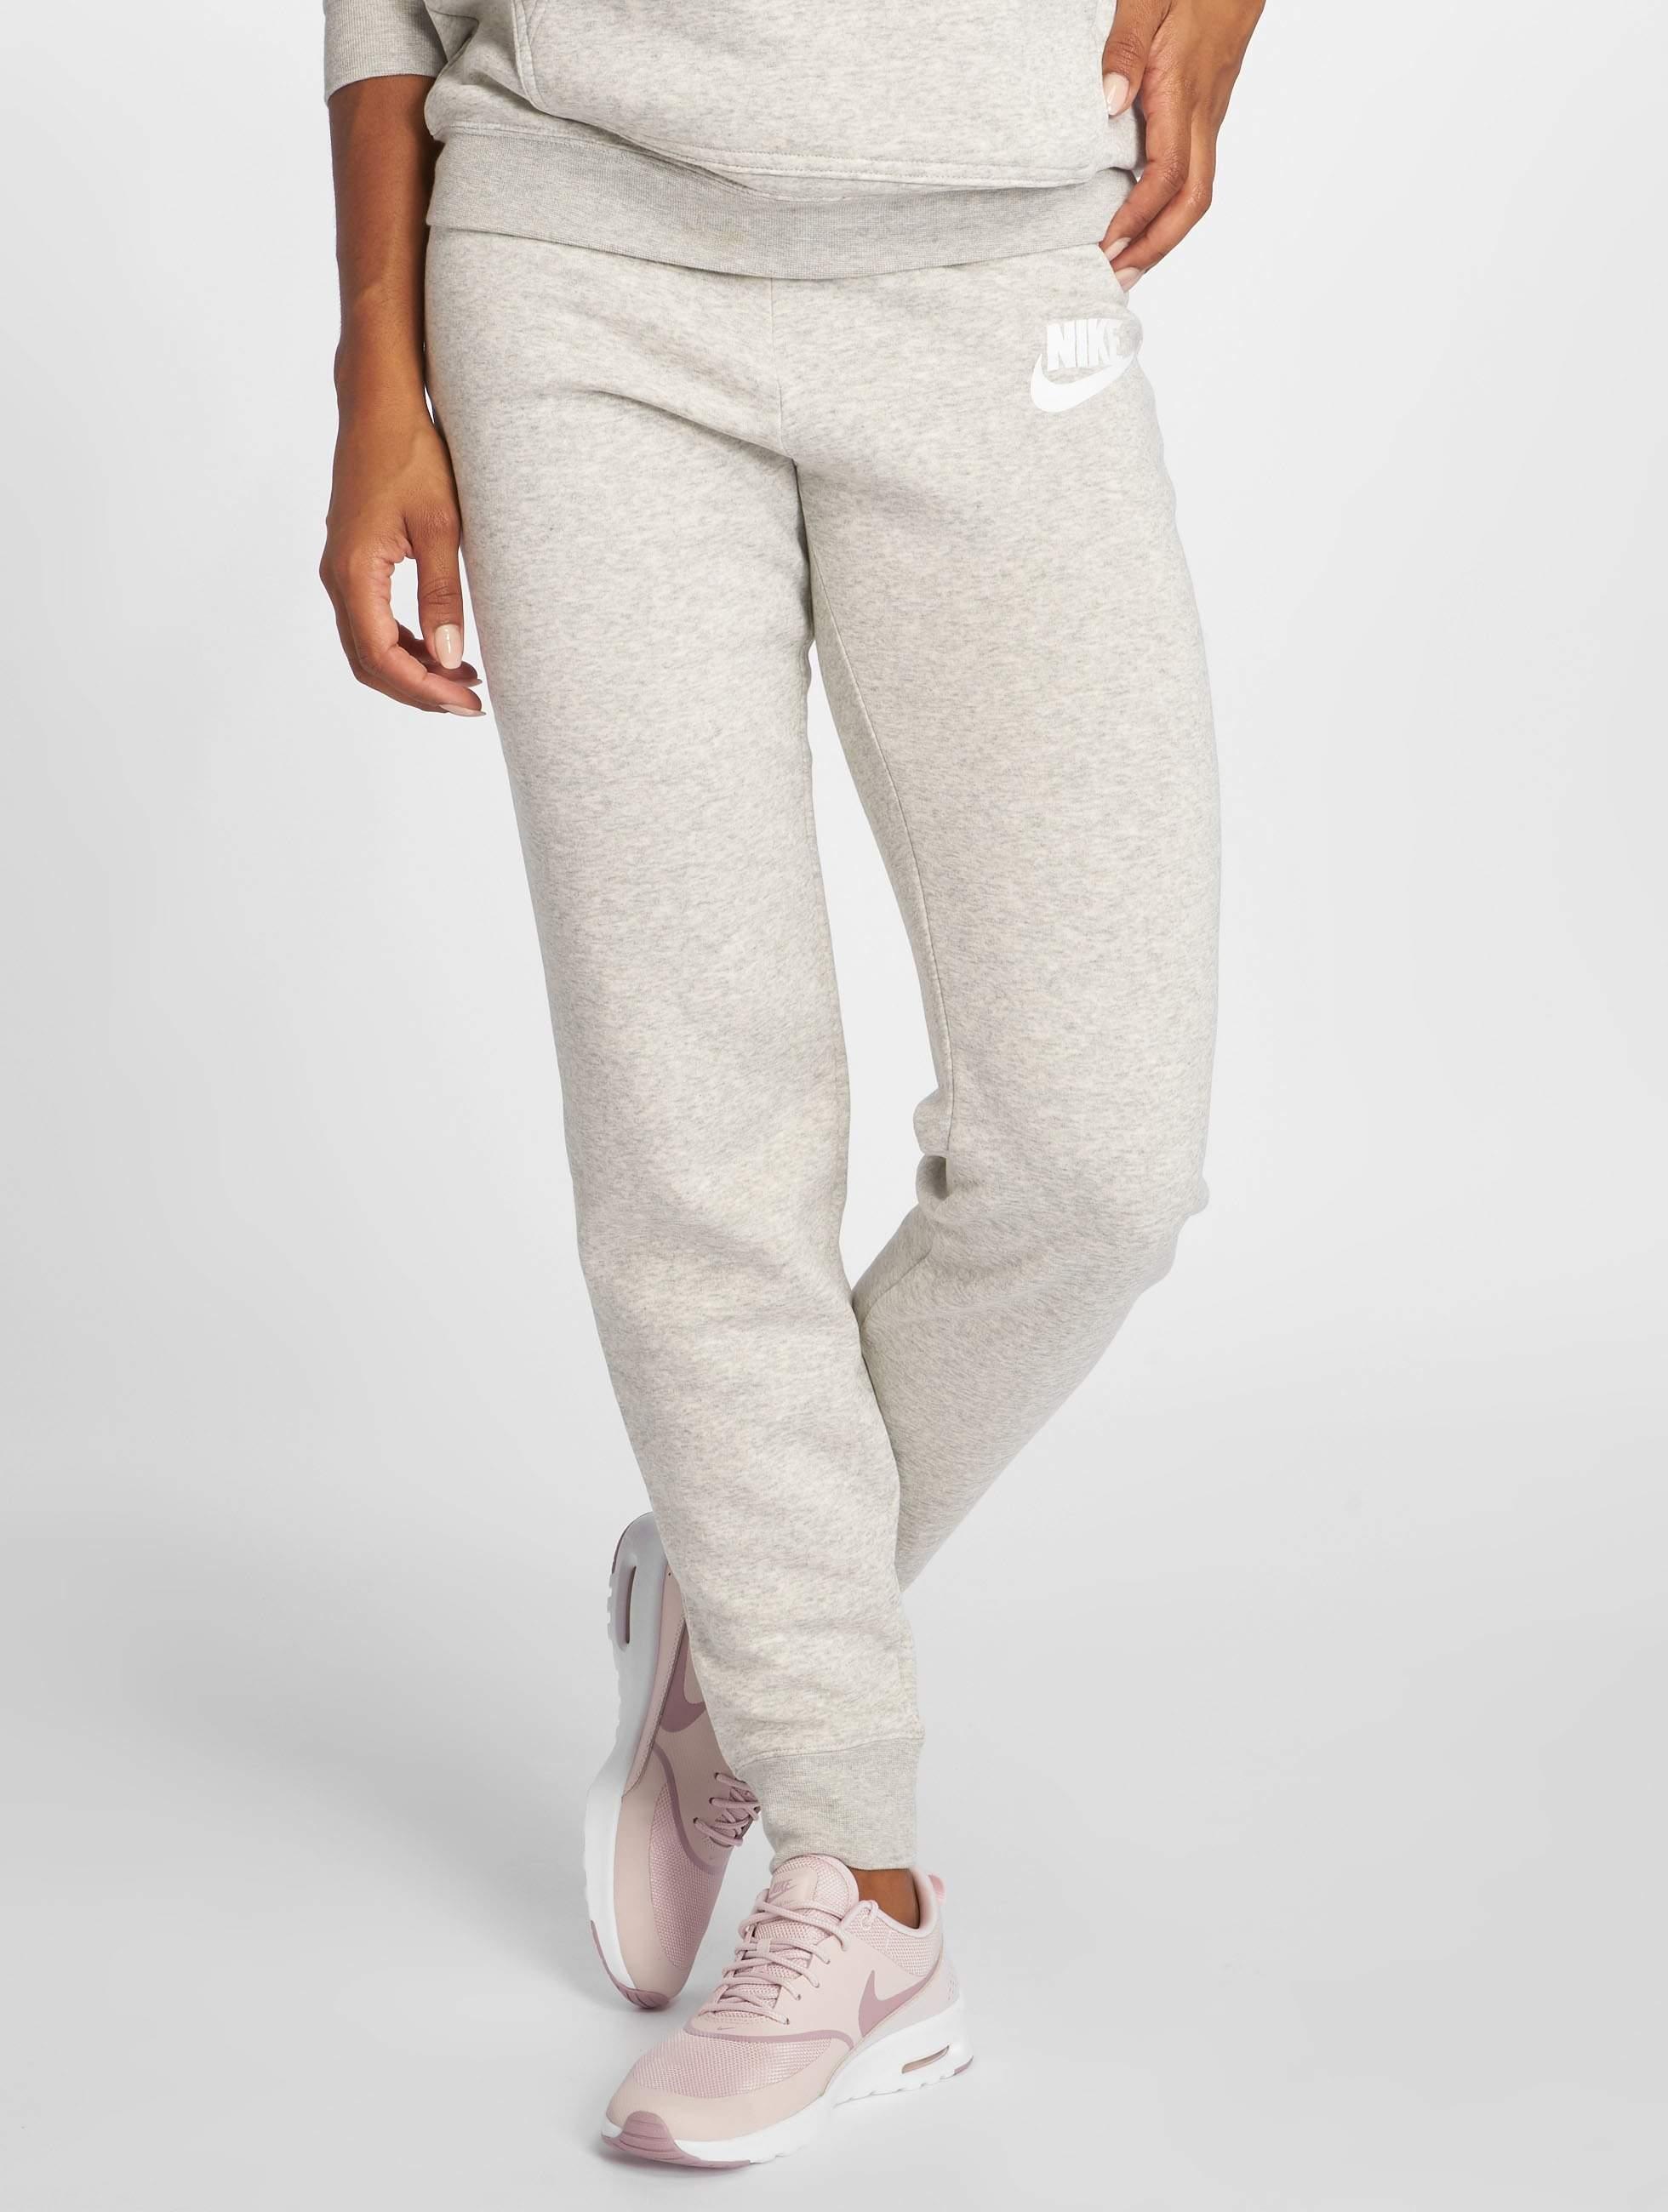 nike damen jogginghose sportswear in grau 466961. Black Bedroom Furniture Sets. Home Design Ideas